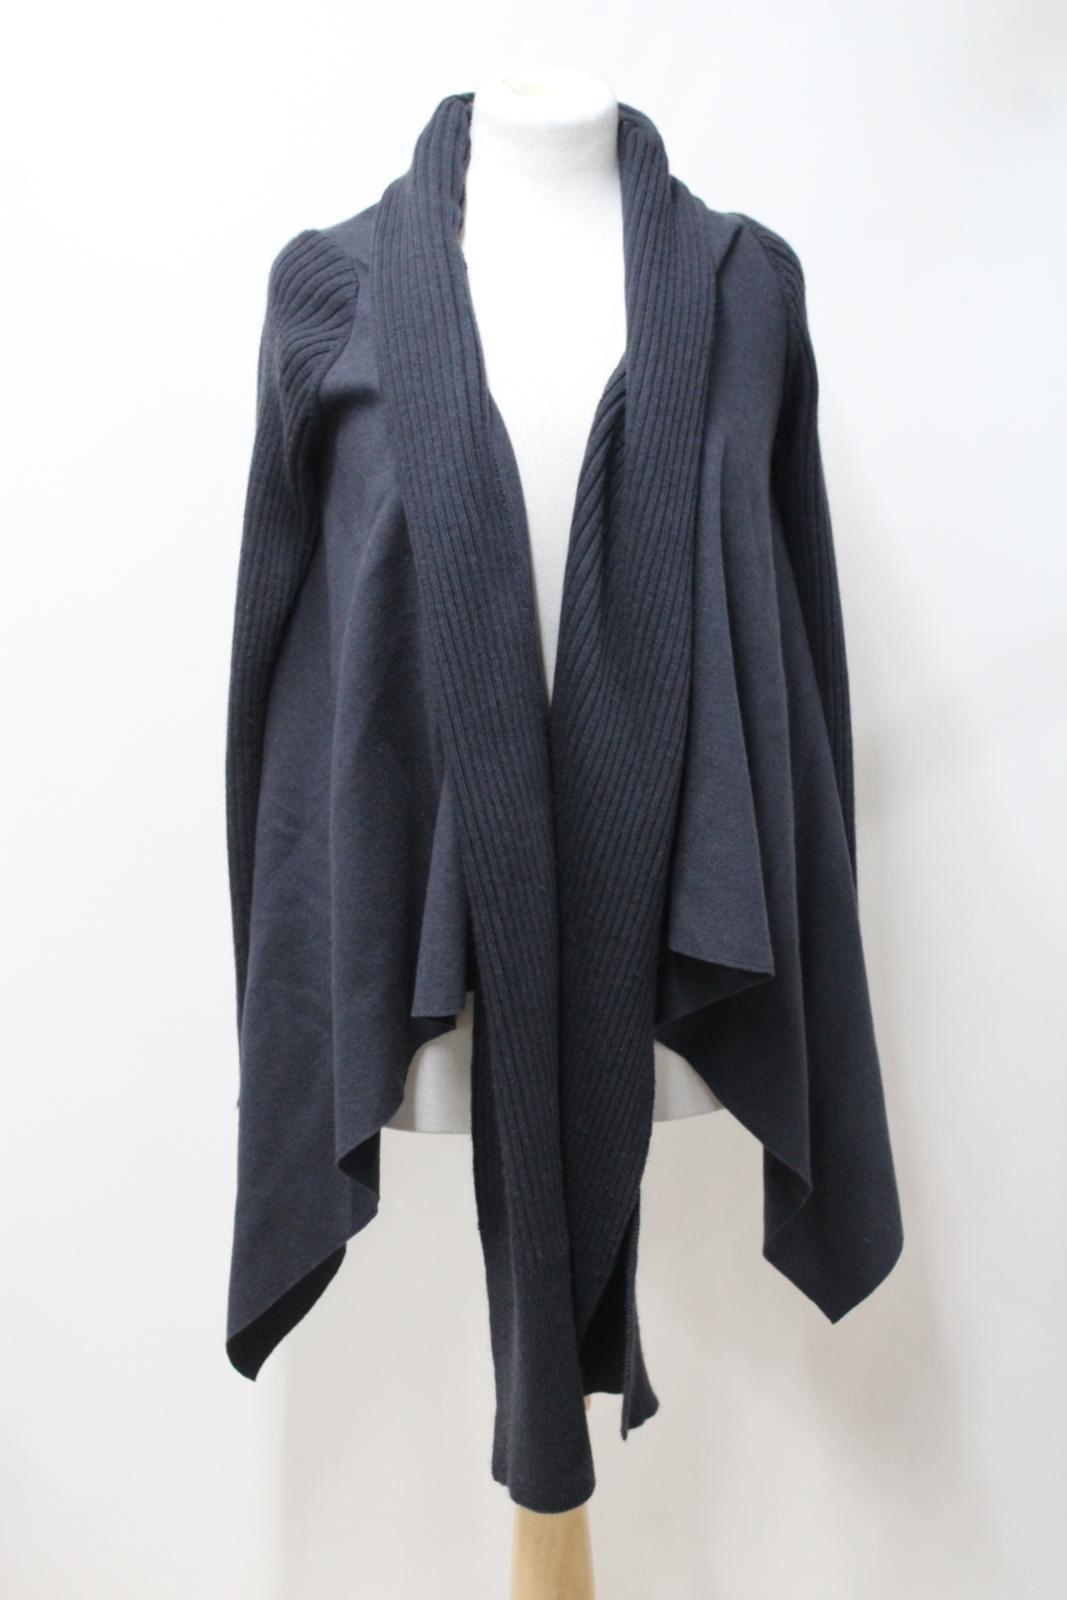 NICOLE-FARHI-Ladies-Grey-Wool-Waterfall-Front-Long-Sleeve-Poncho-Style-Jacket-S